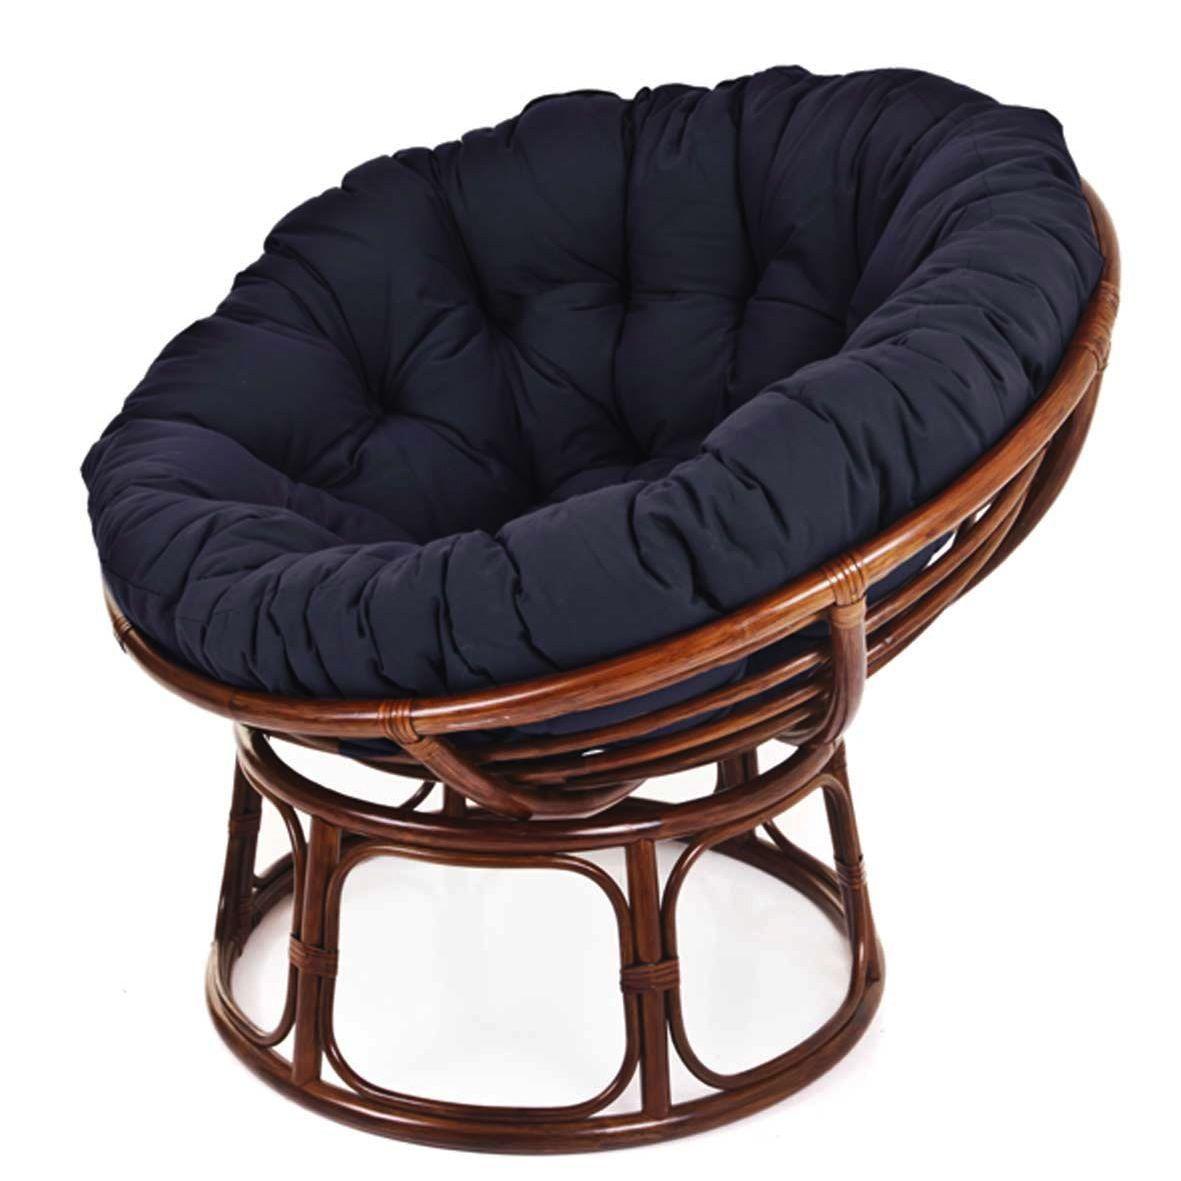 folding papasan chair target unique accent chairs gorgeus 1774 design tornillo